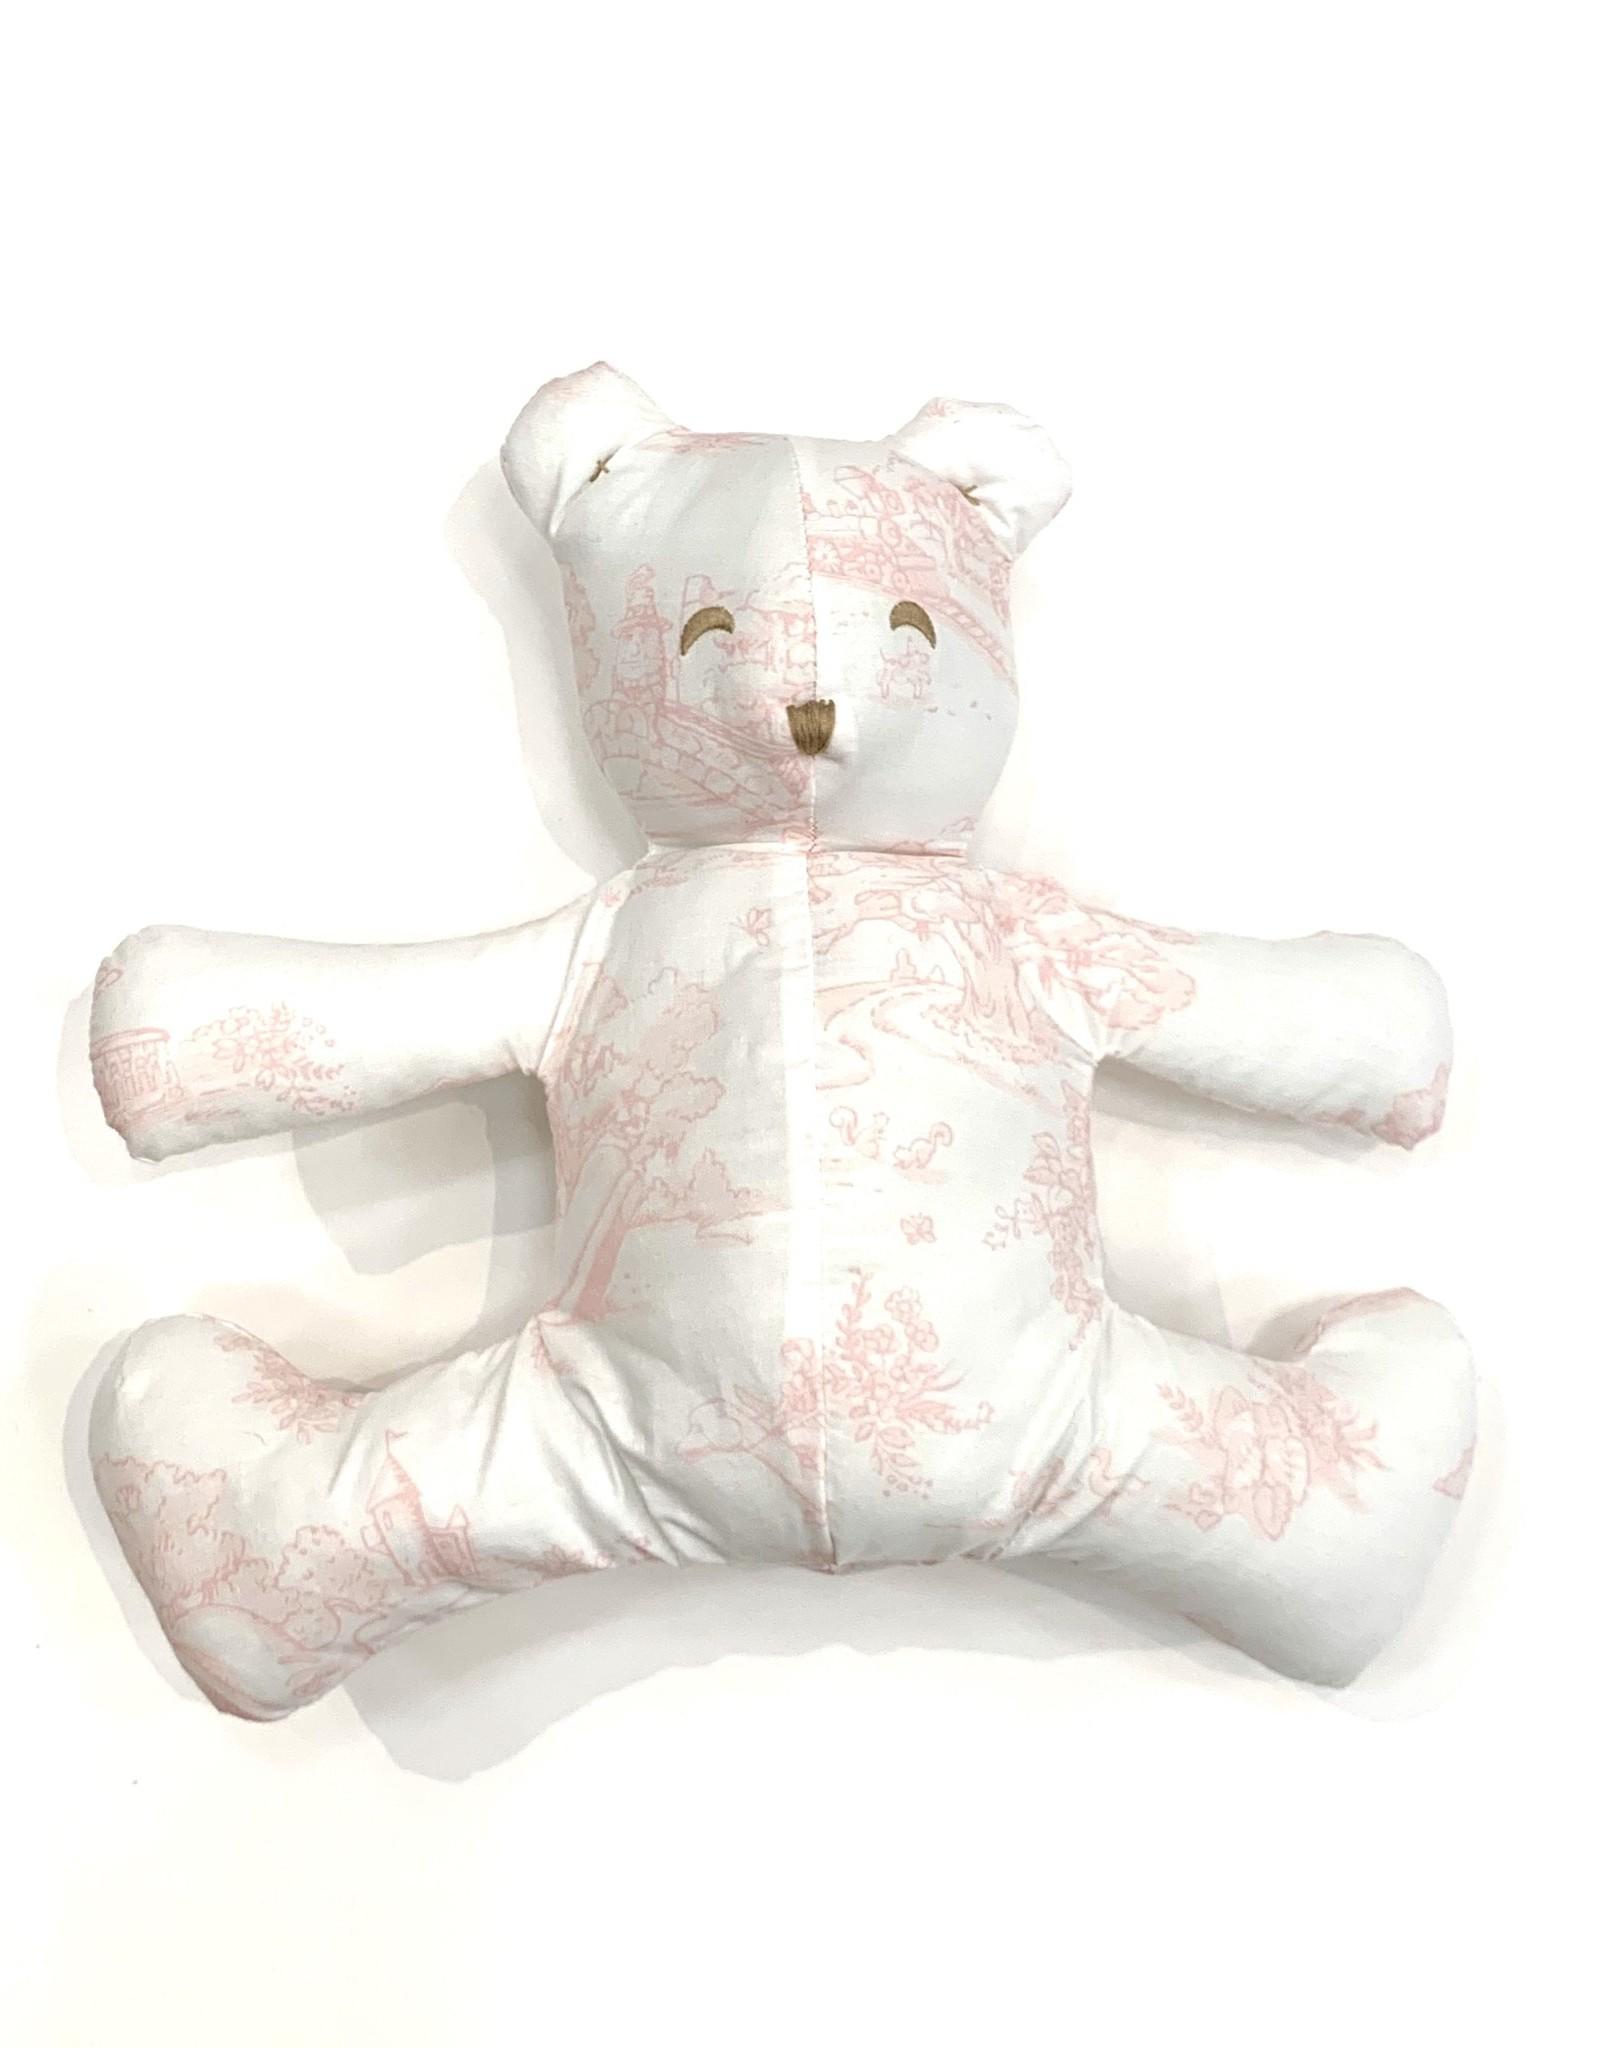 Maison Nola Toile Bear Pink